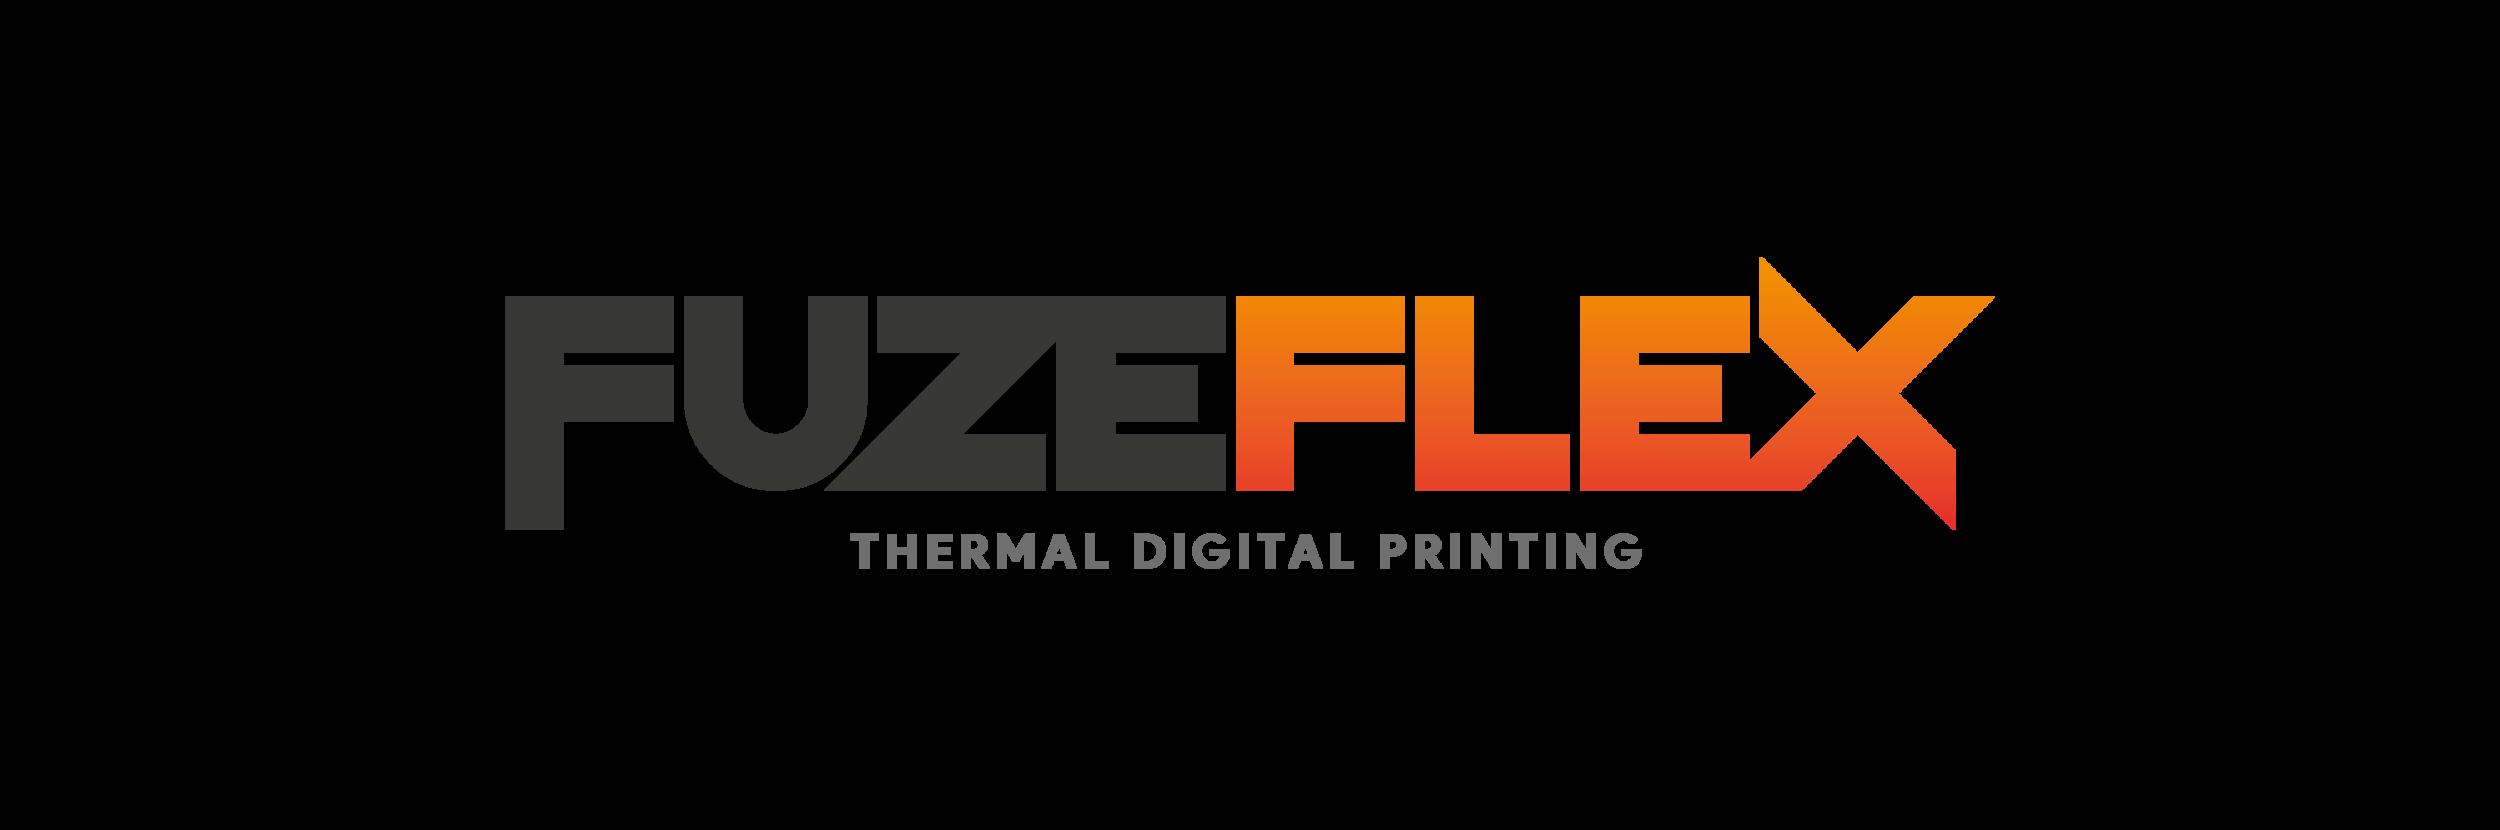 What We Do_sm_FUZE FLEX.png